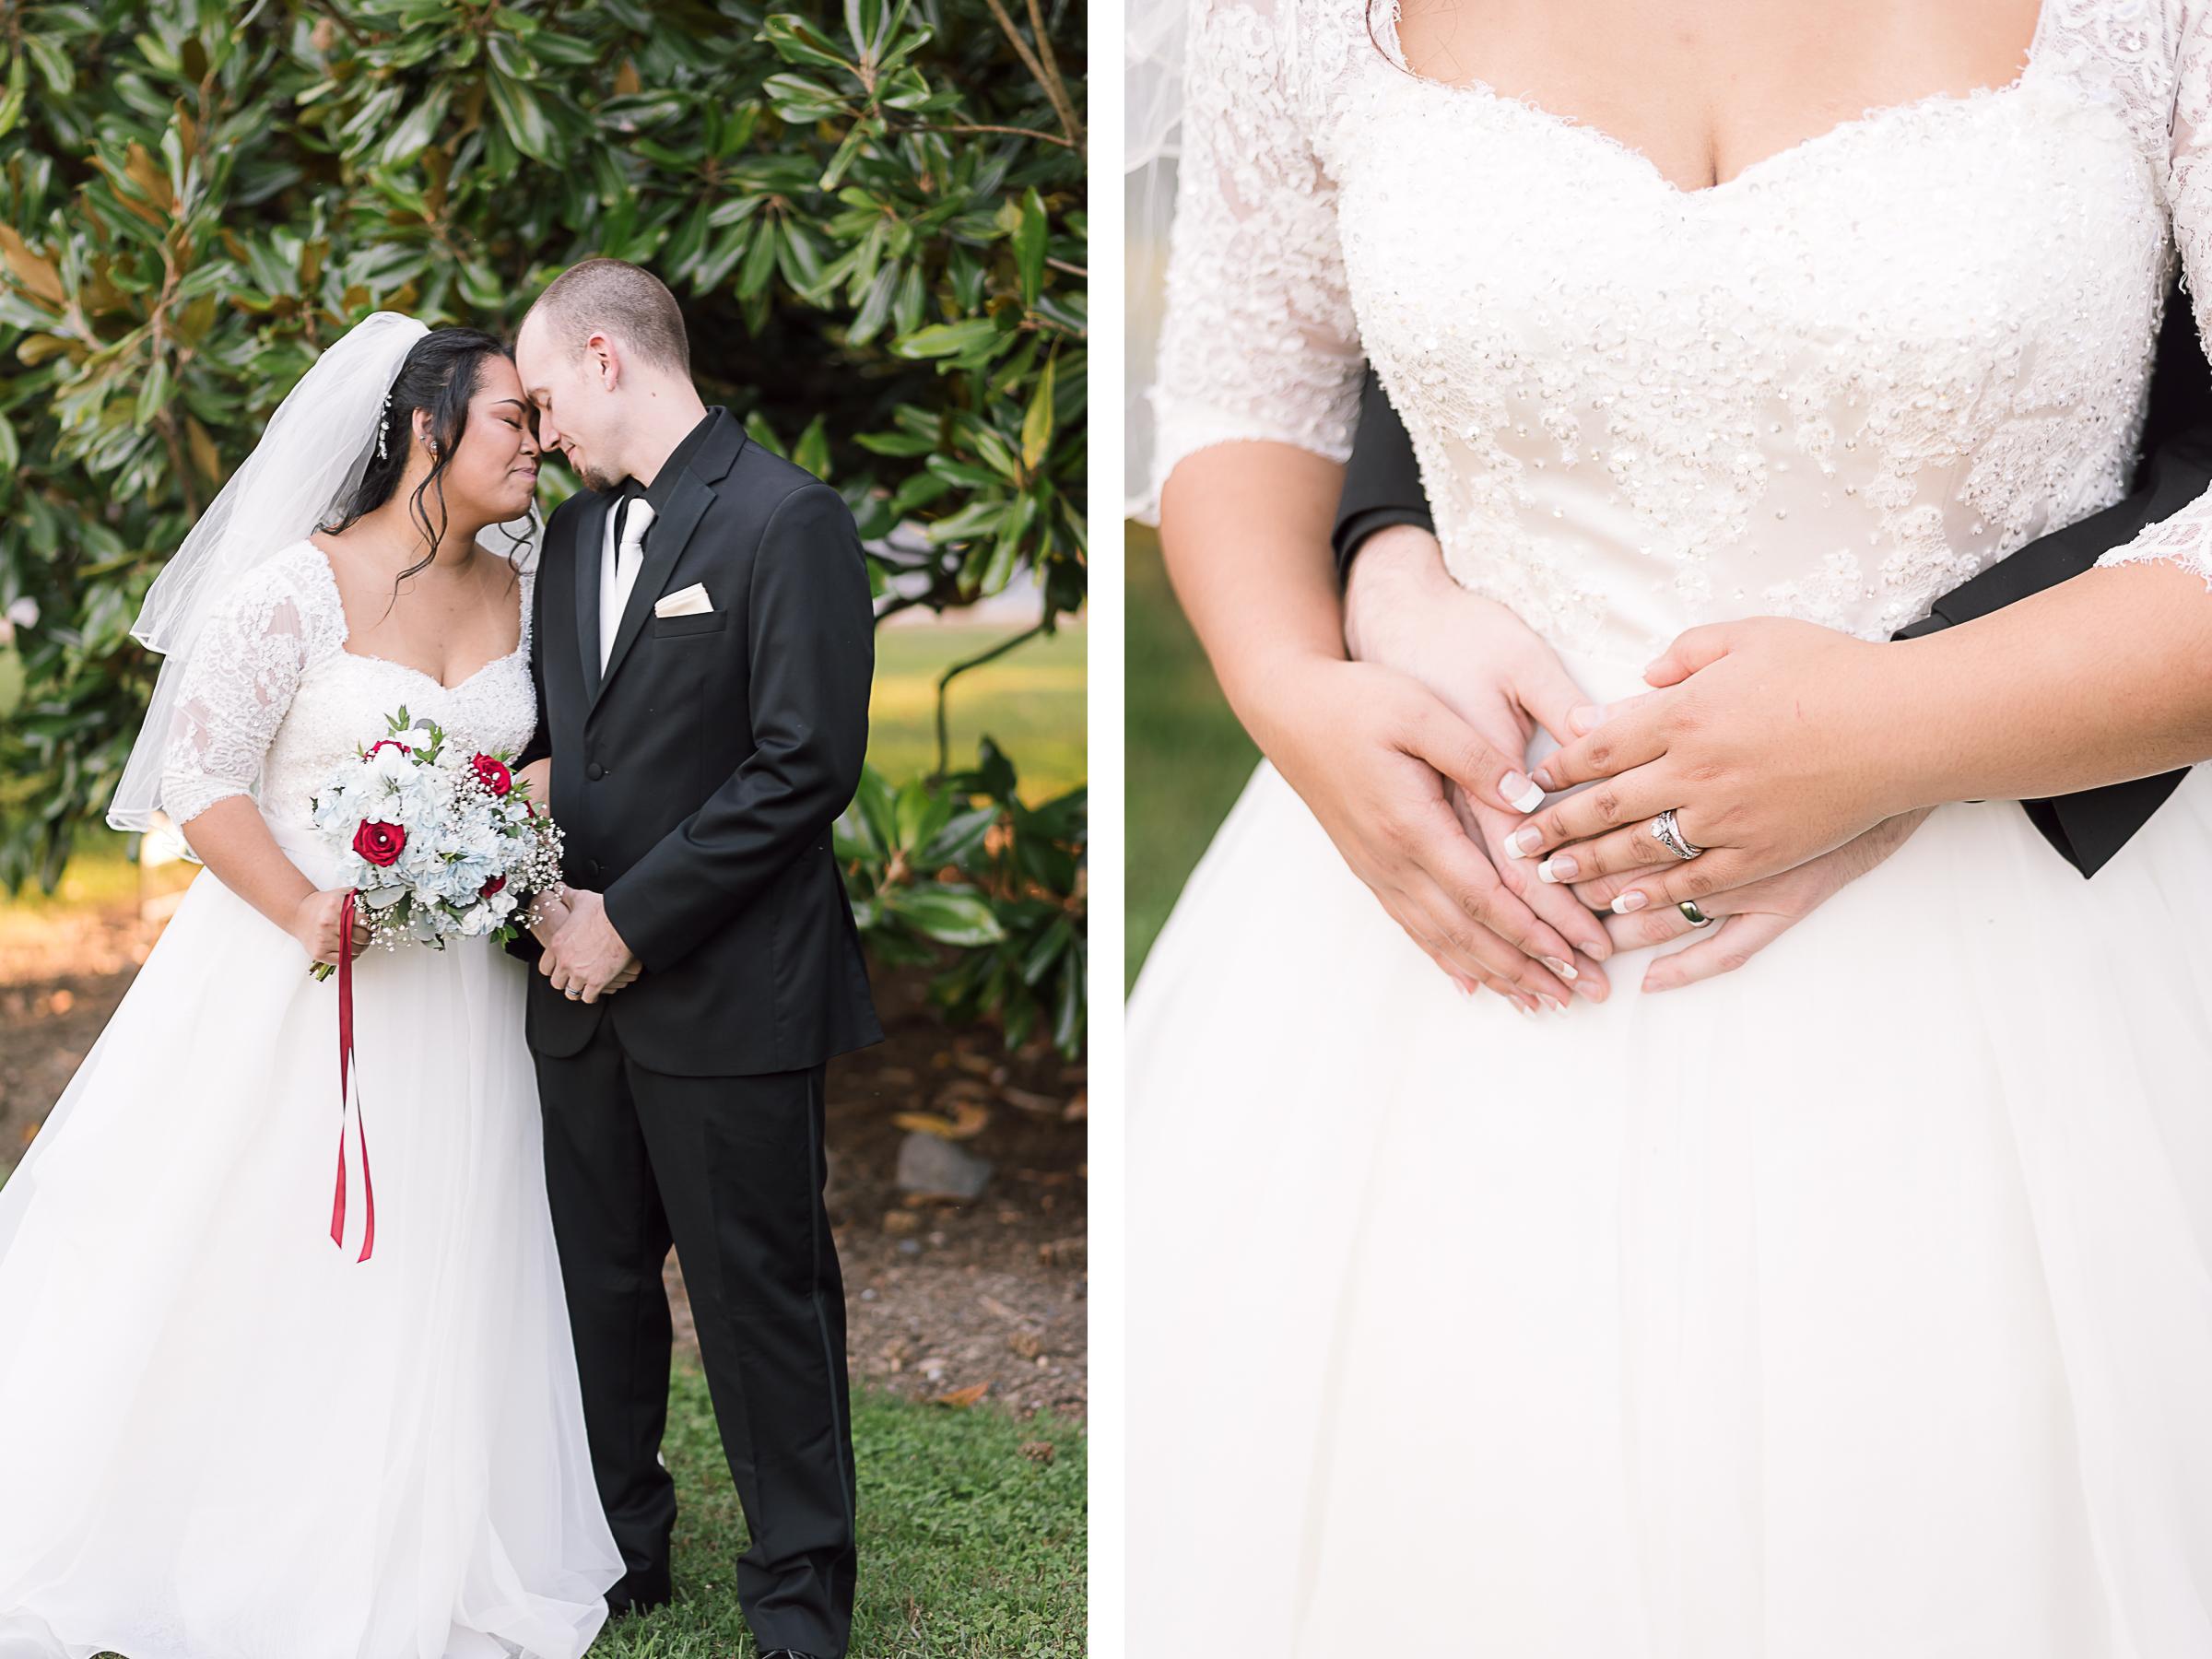 Maryland-Kentlands-Mansion-Wedding-Bride-Groom-87.jpg